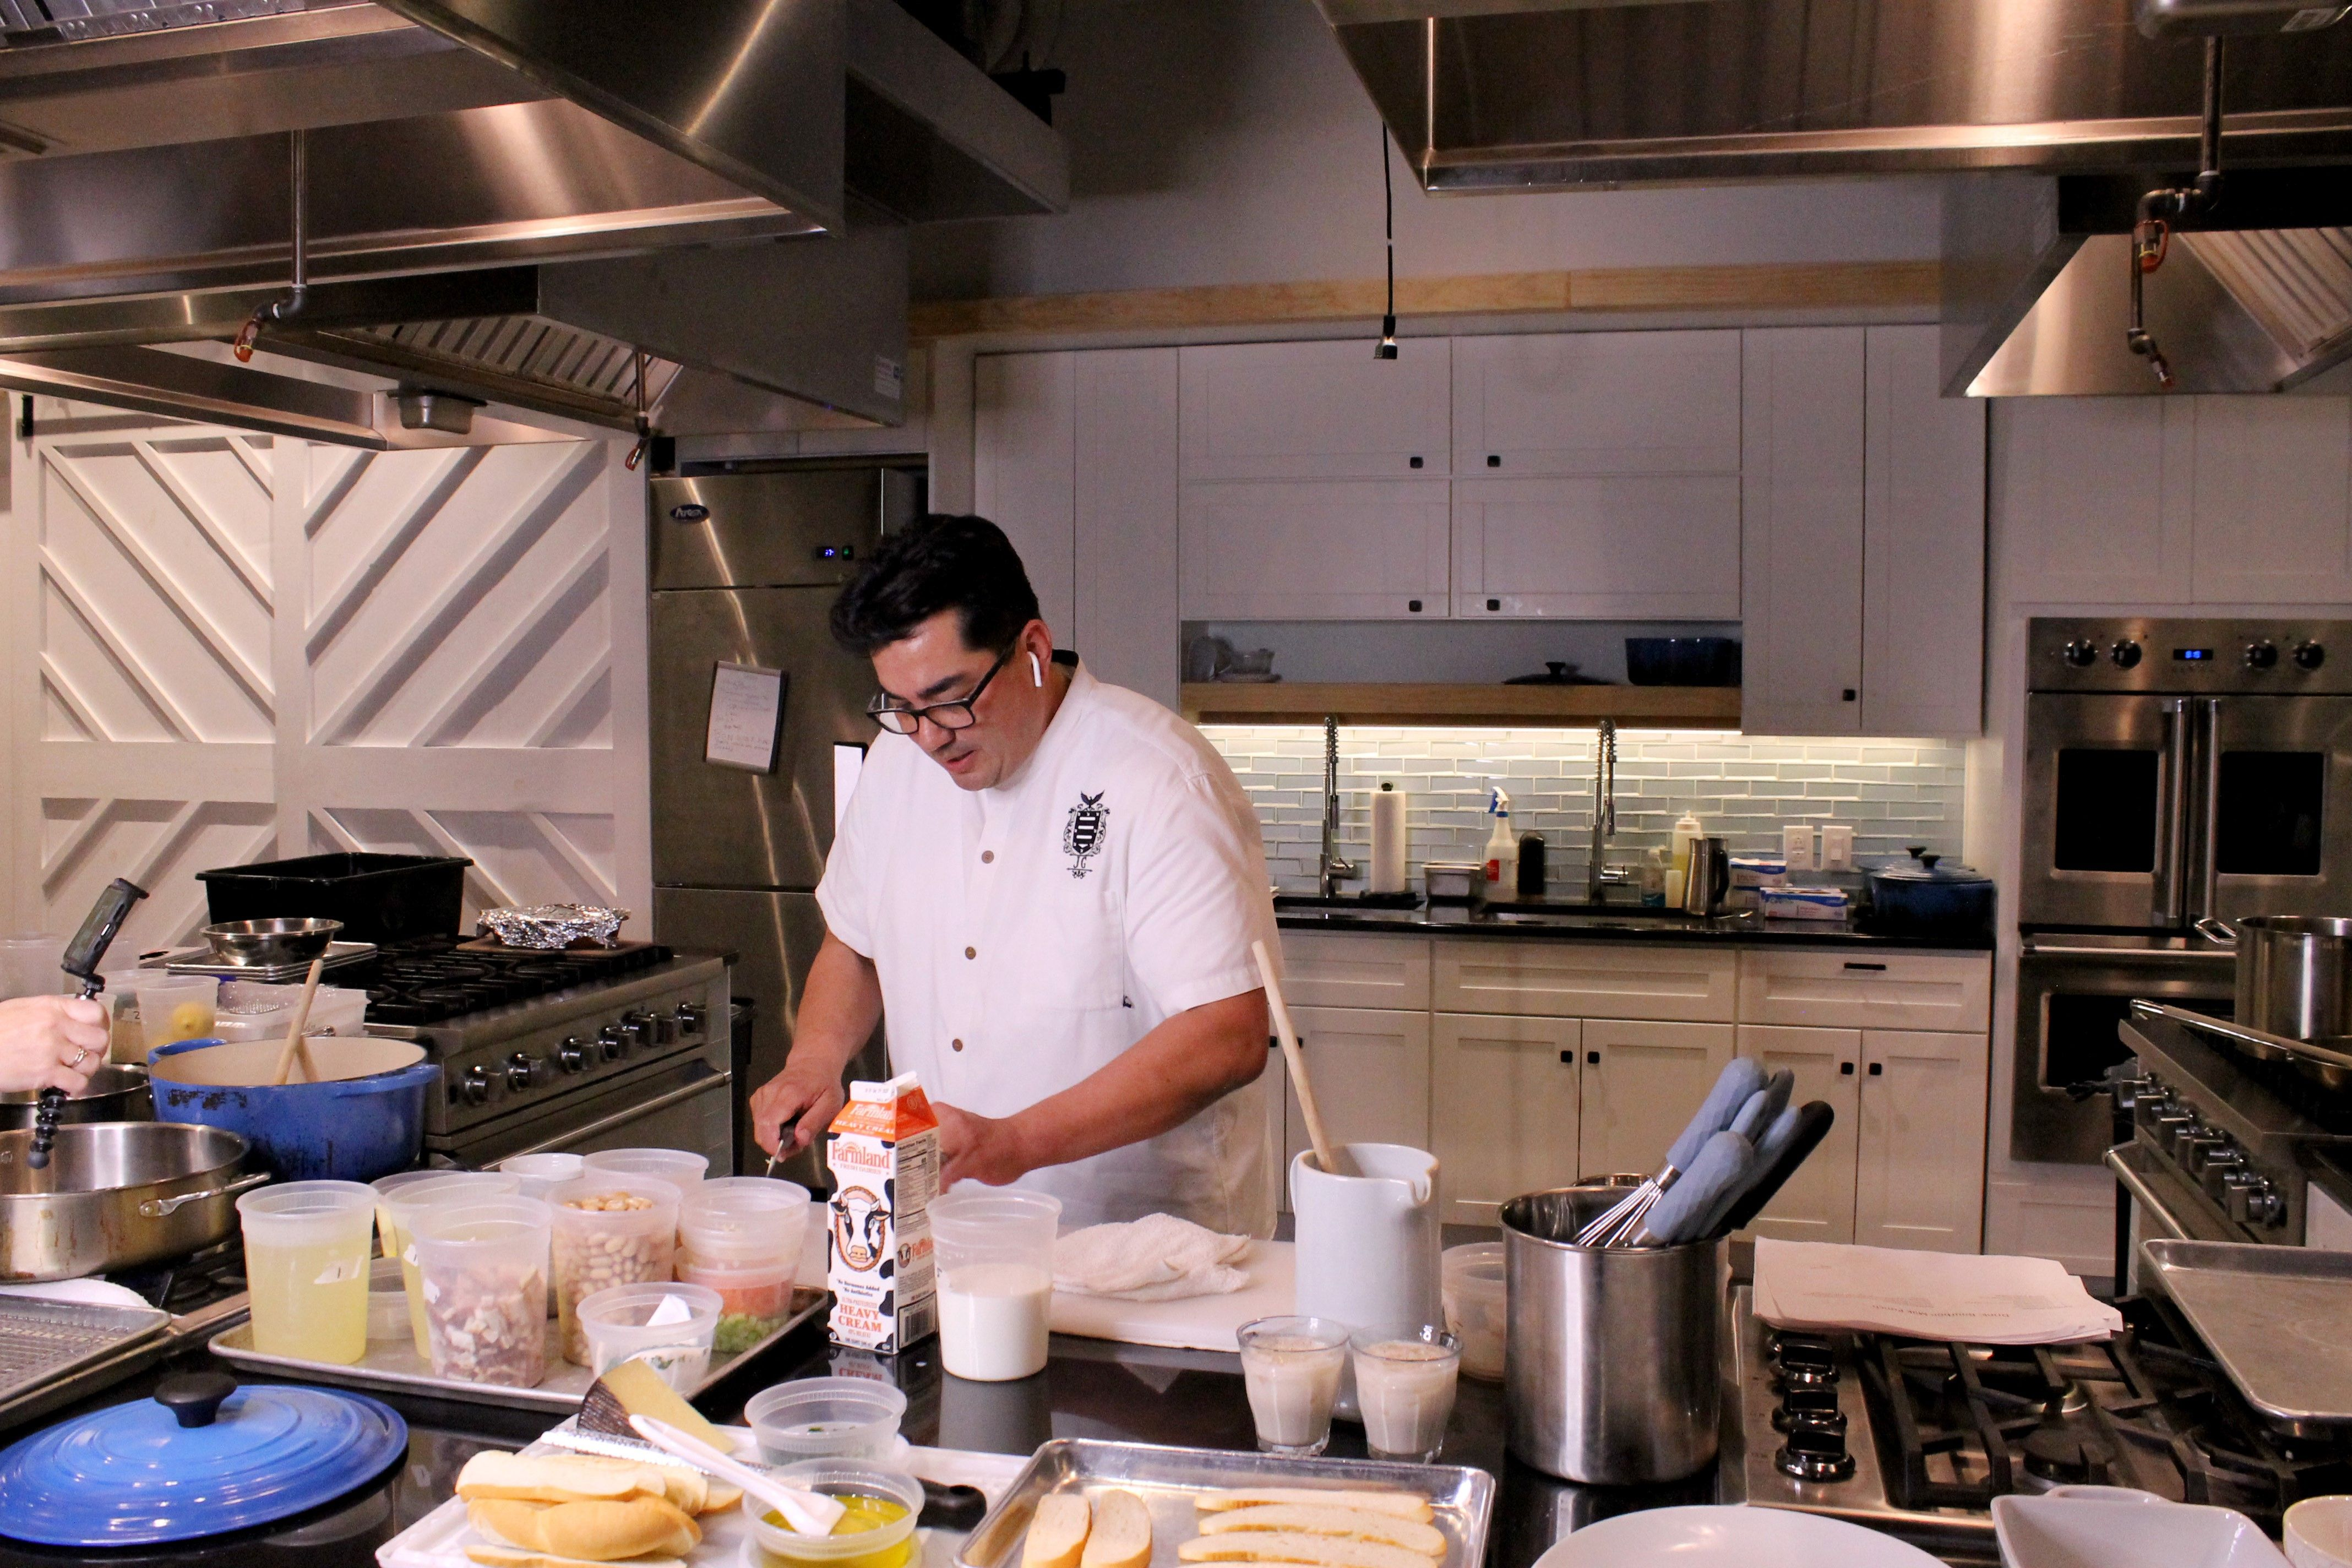 Photo Courtesy of Chef Jose Garces